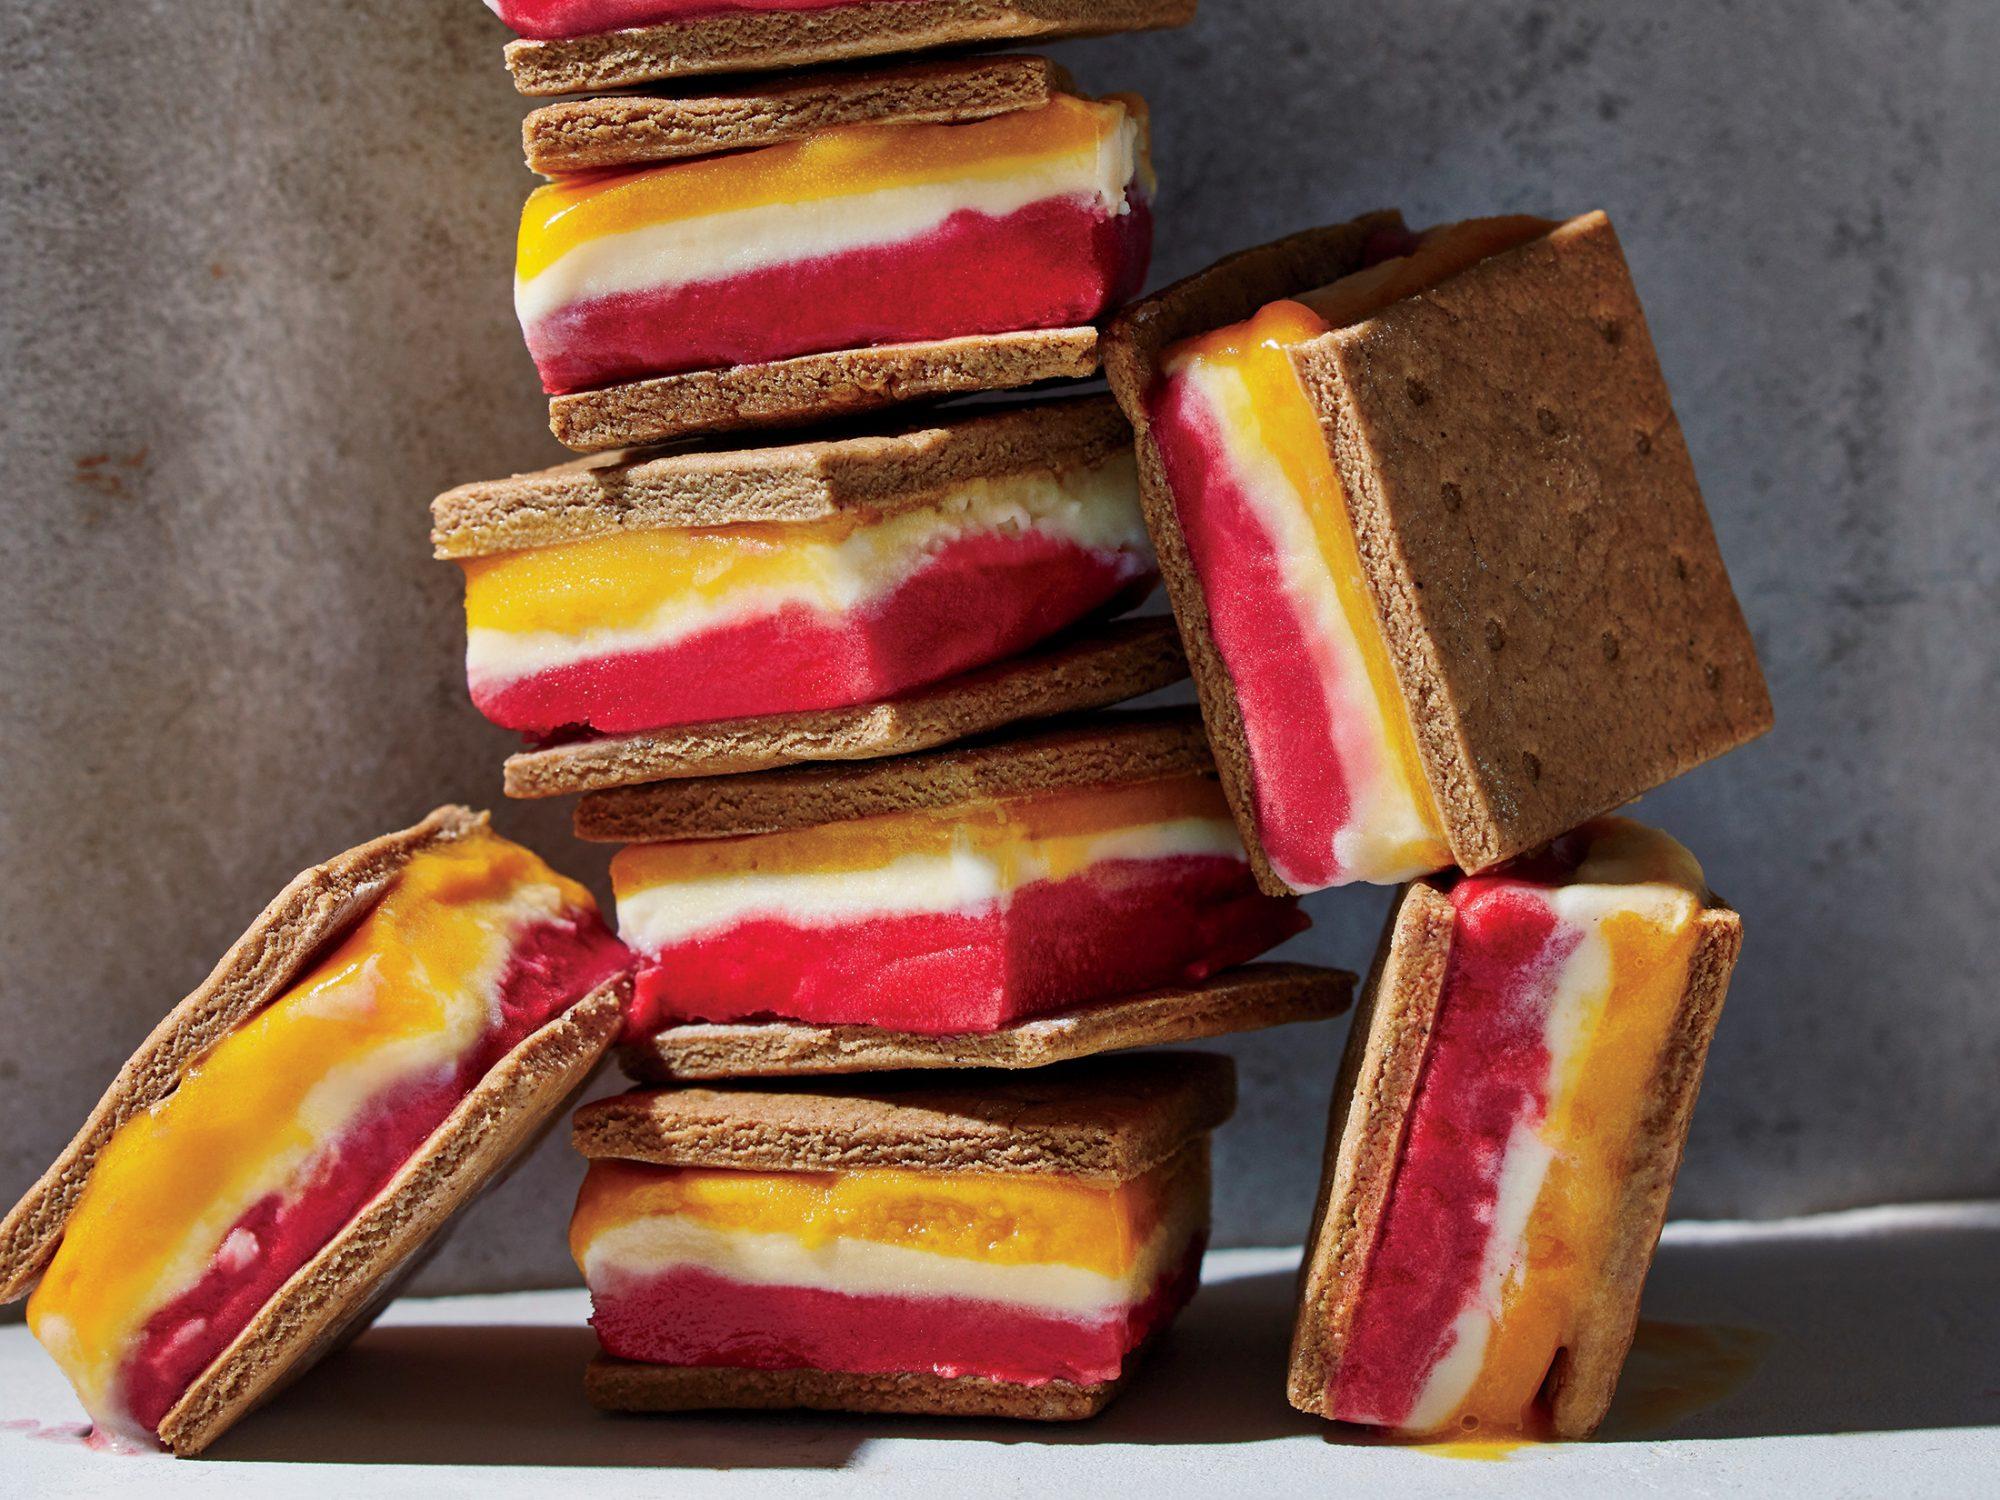 Striped Yogurt-and-Sorbet 'Ice Cream' Sandwiches